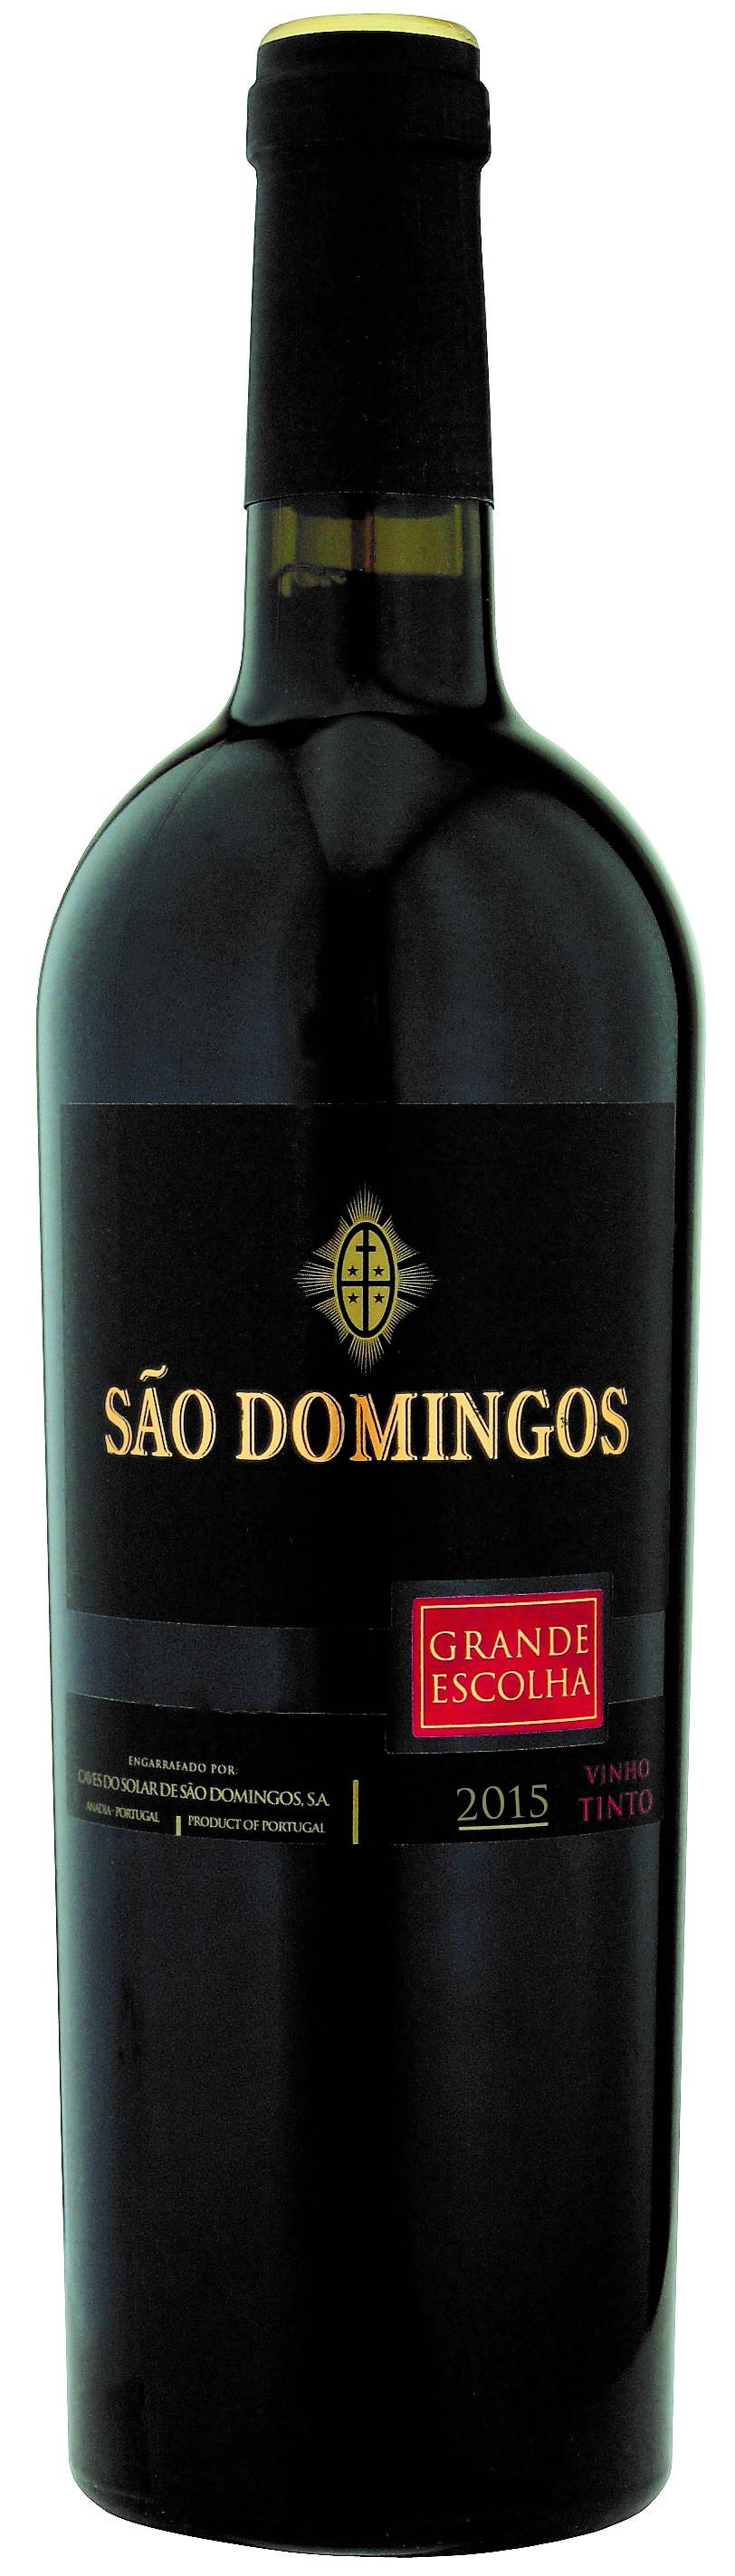 Grande Escolha Red Wine